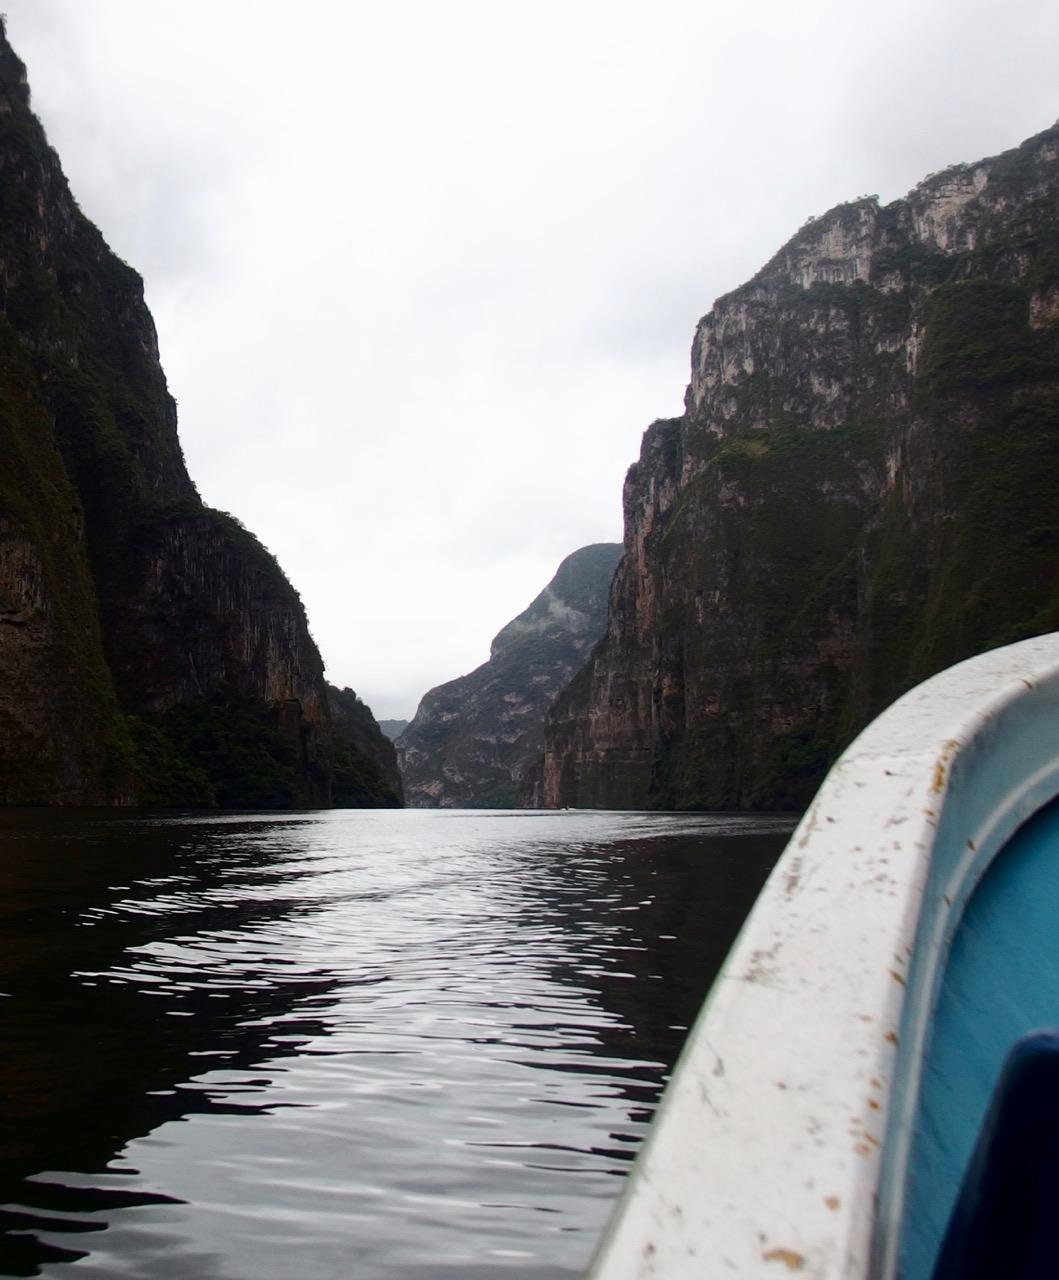 Sumidero Canyon, Chiapas, Mexico